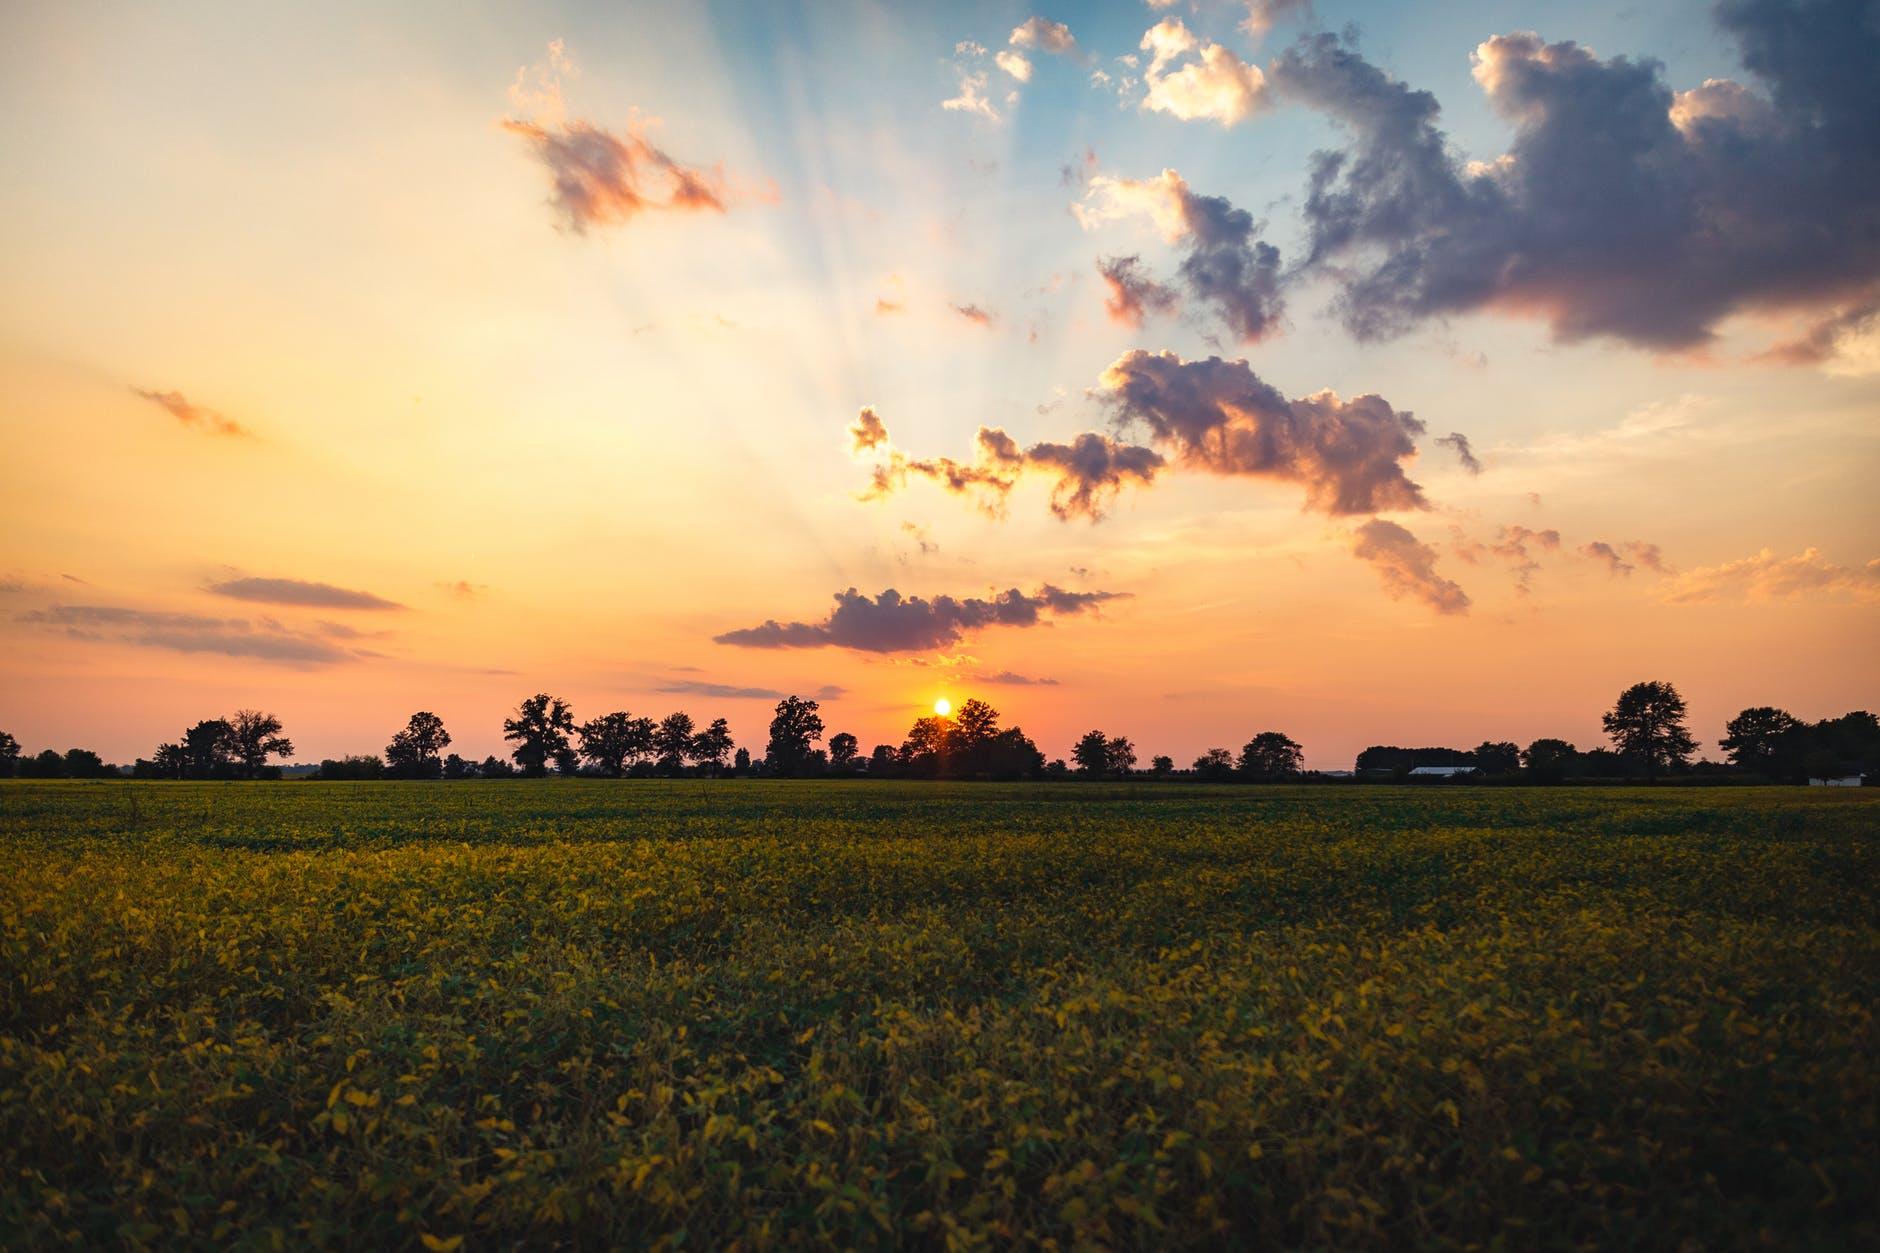 sunset sunrise nature field